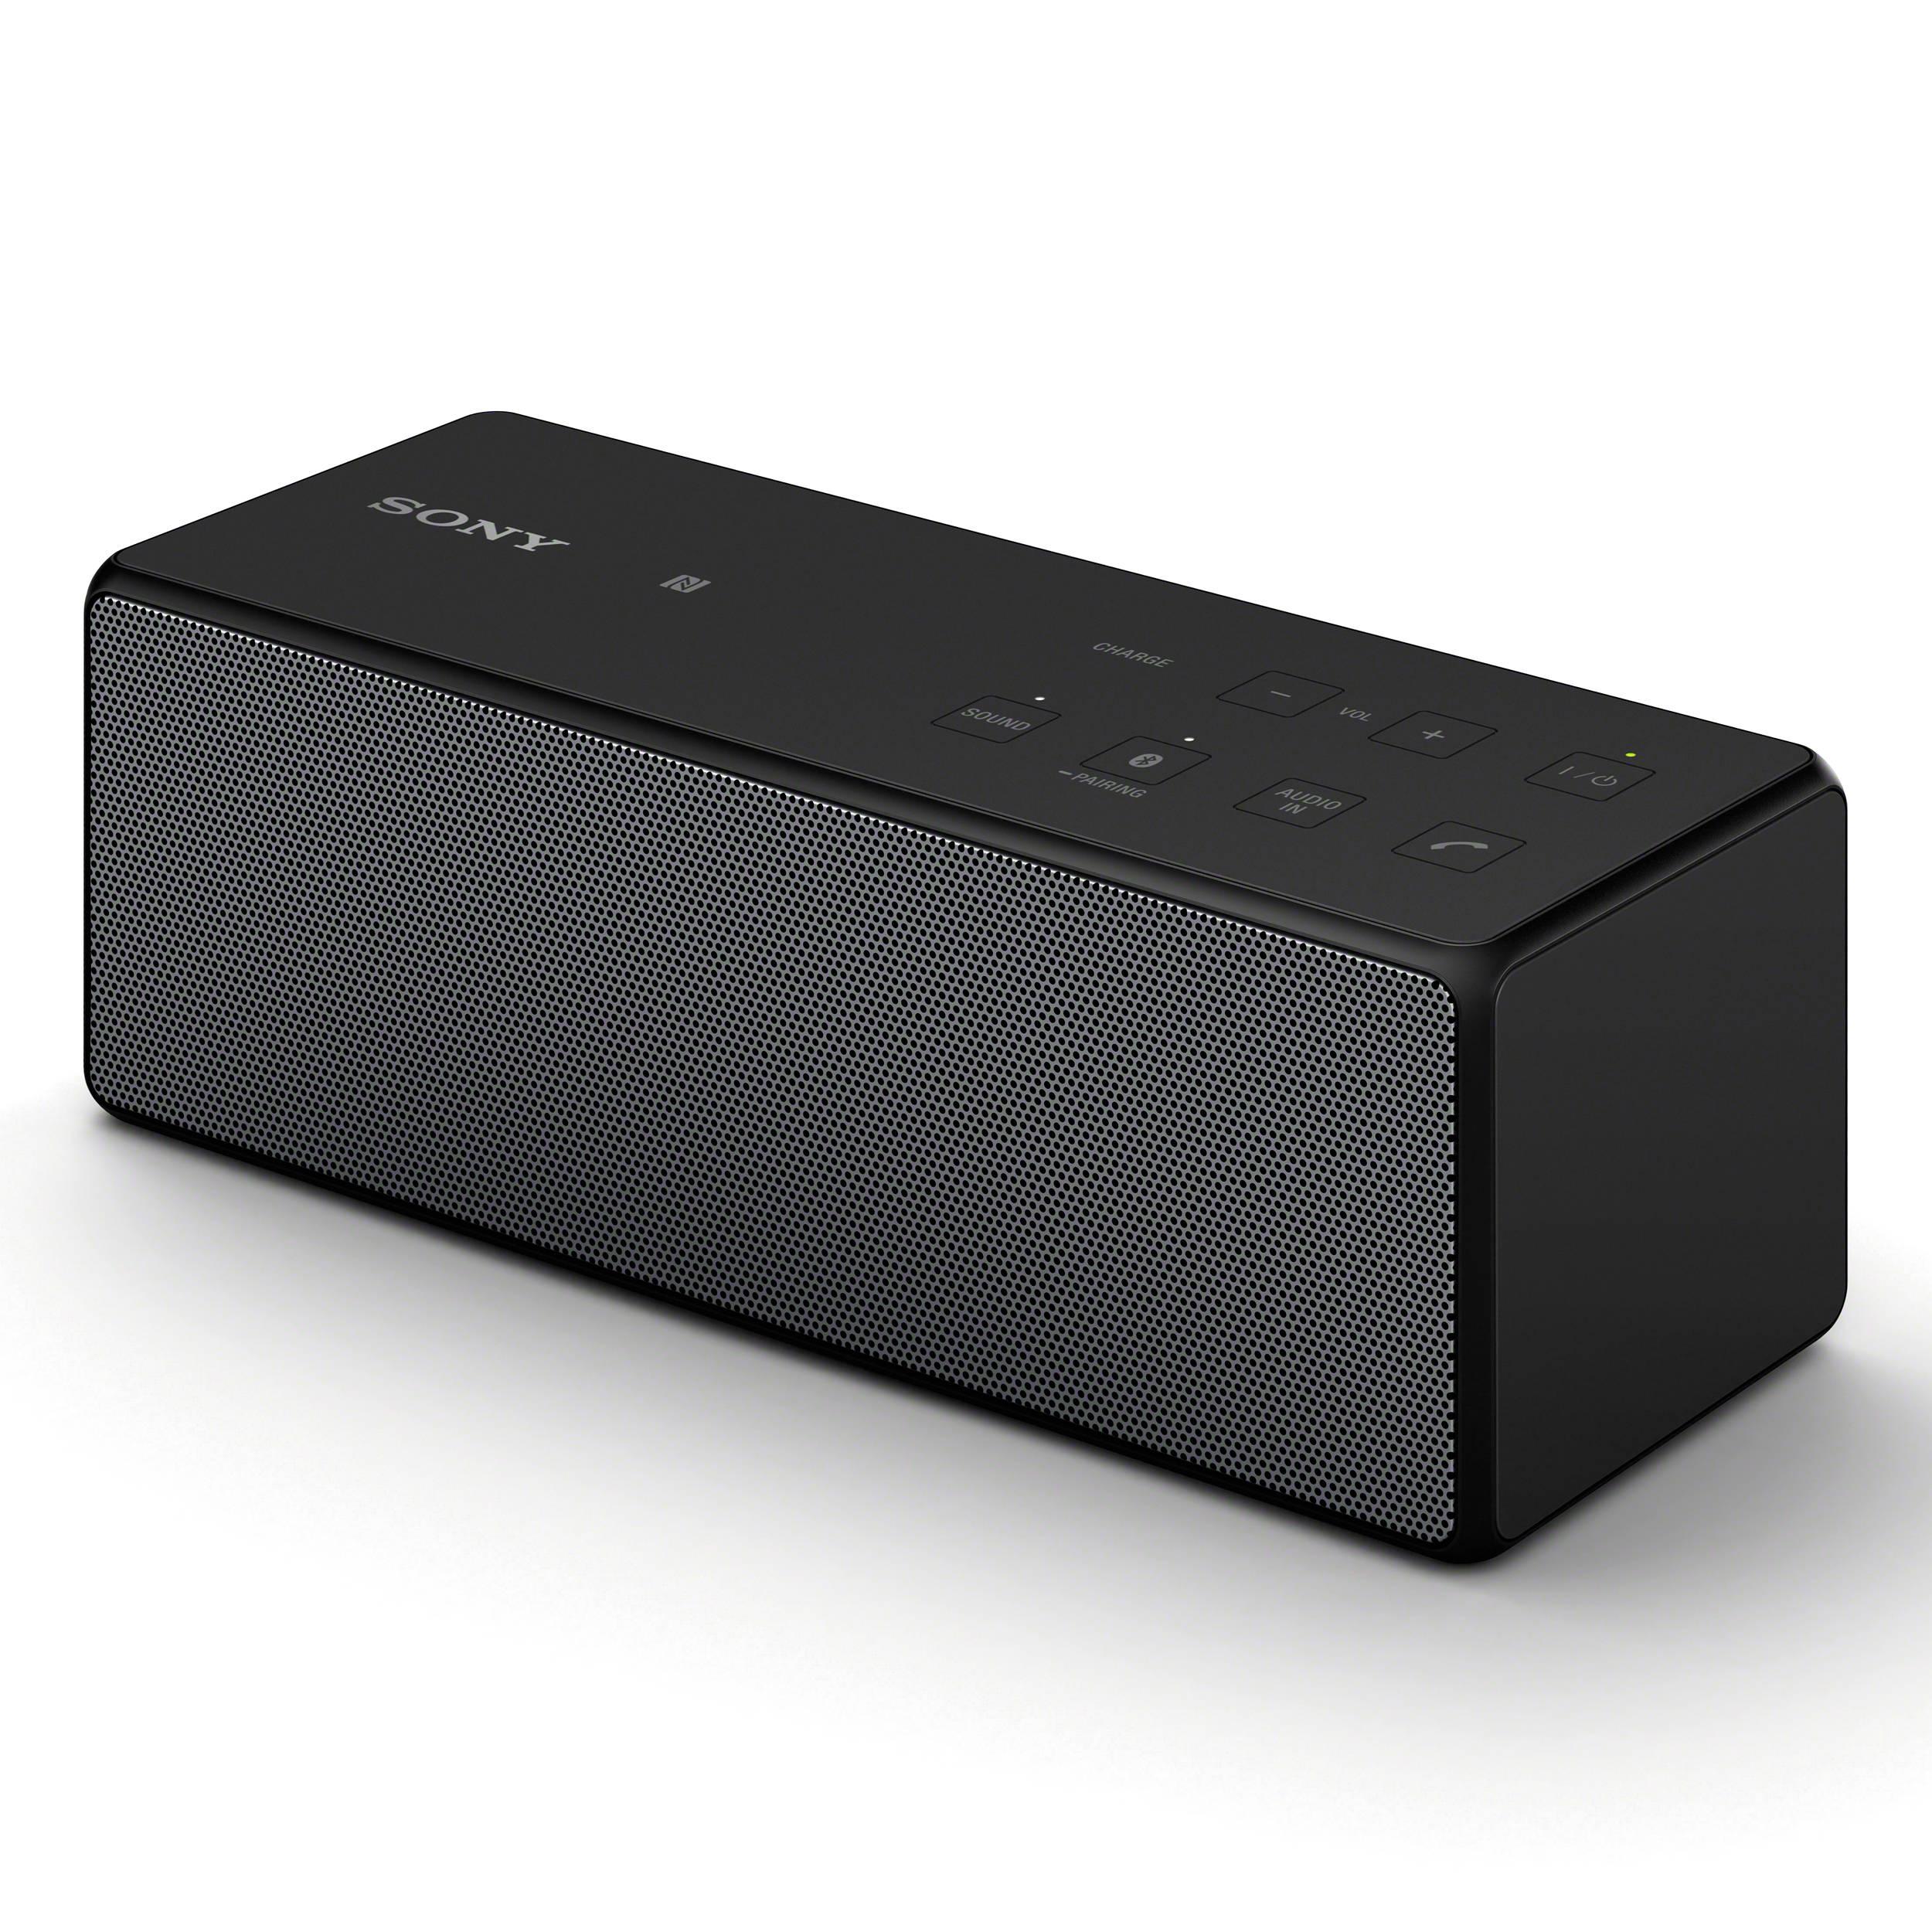 sony portable bluetooth speaker black srsx3 blk b h photo rh bhphotovideo com Magnavox Portable Speaker sony bluetooth speaker user manual